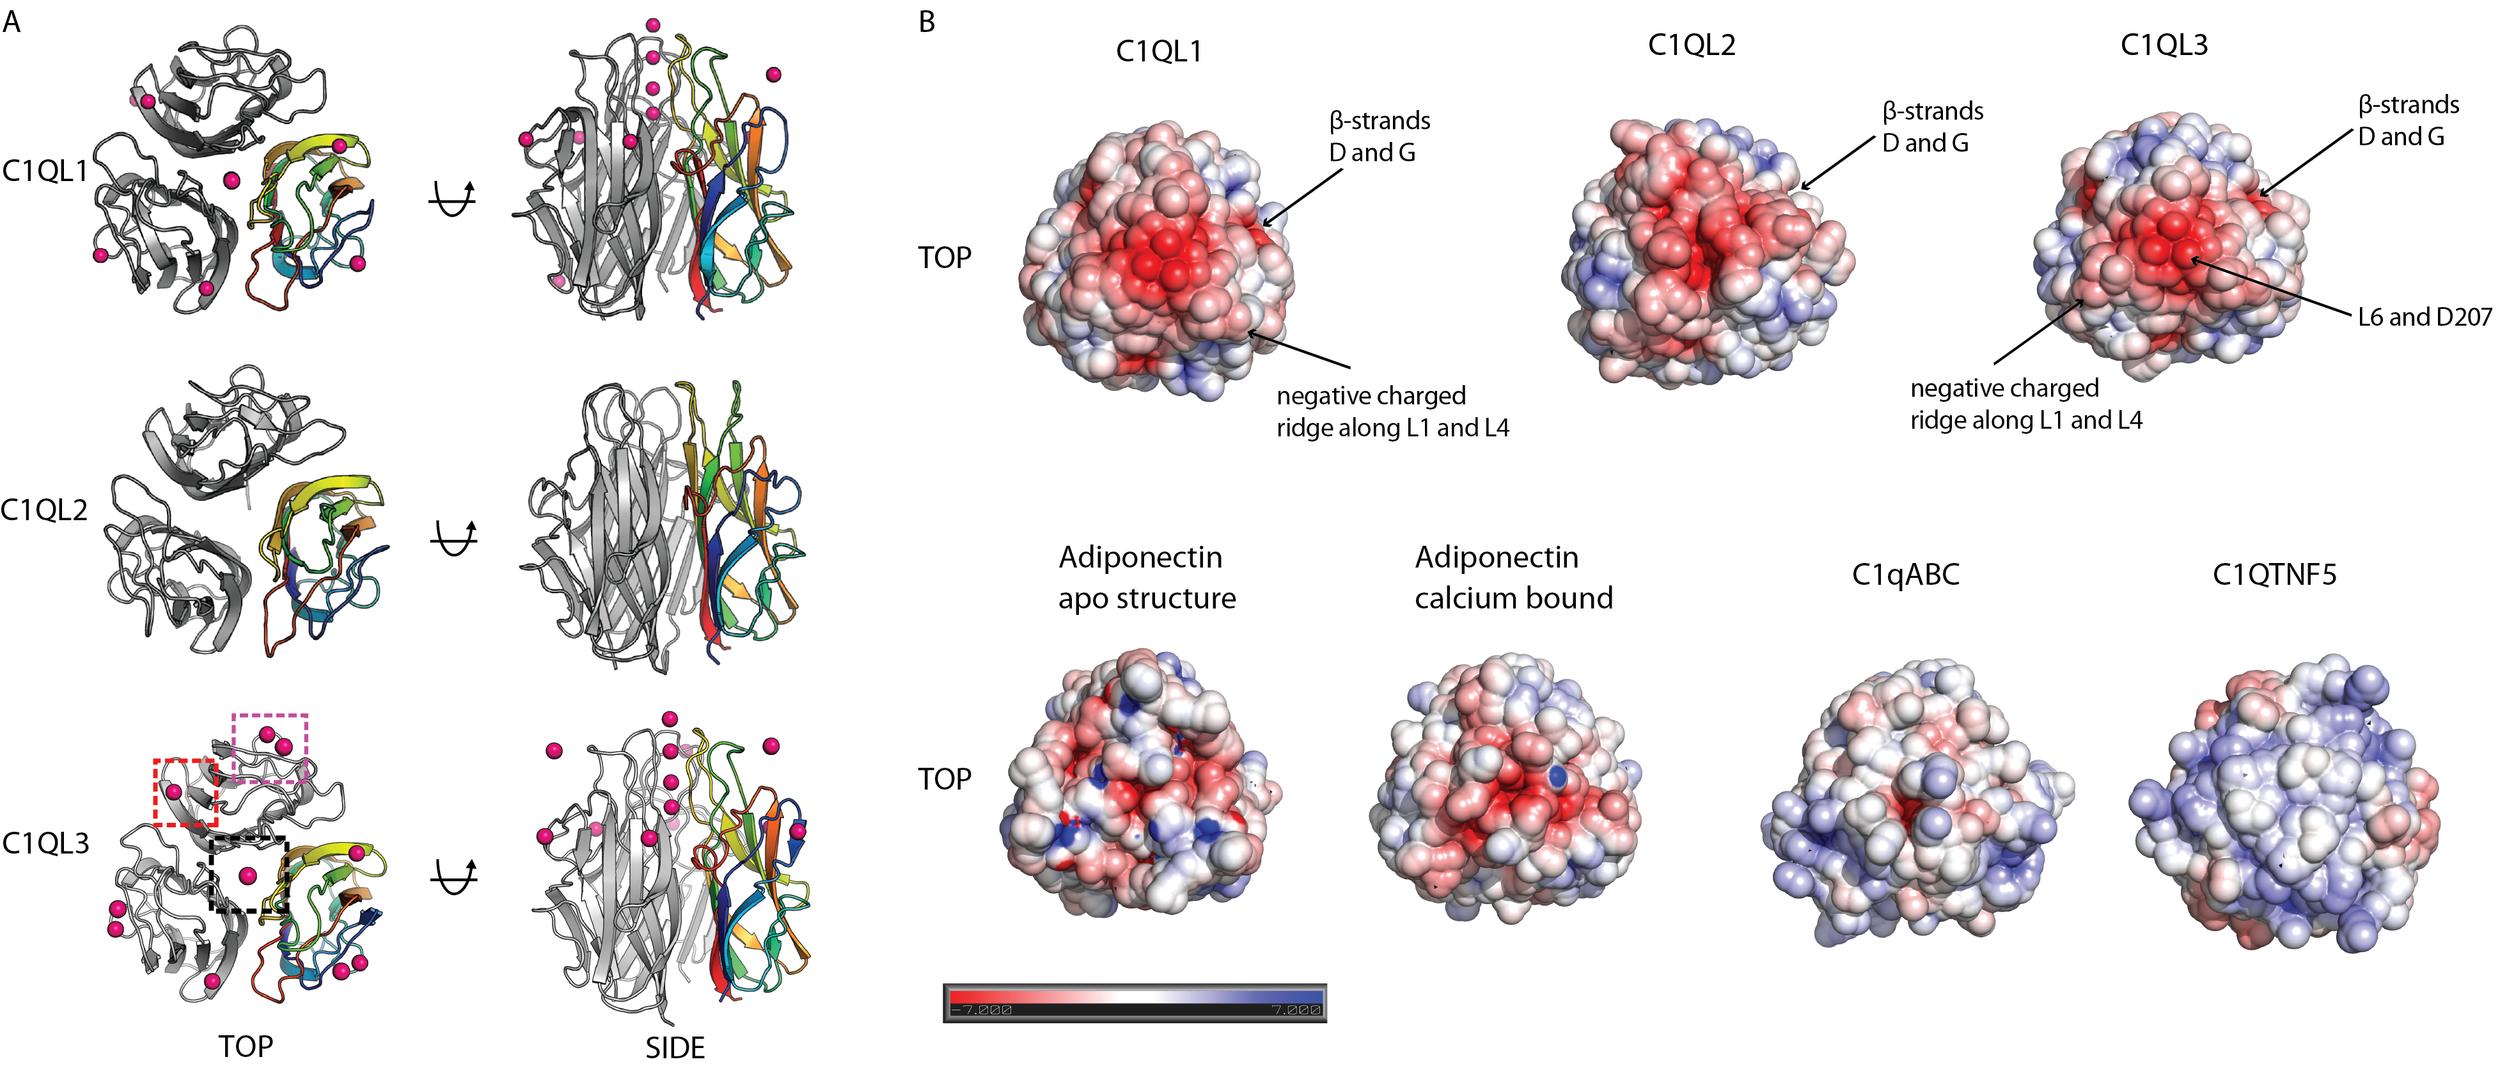 Crystal Structures of Globular C1q Domains of C1QL1, C1QL2 and C1QL3